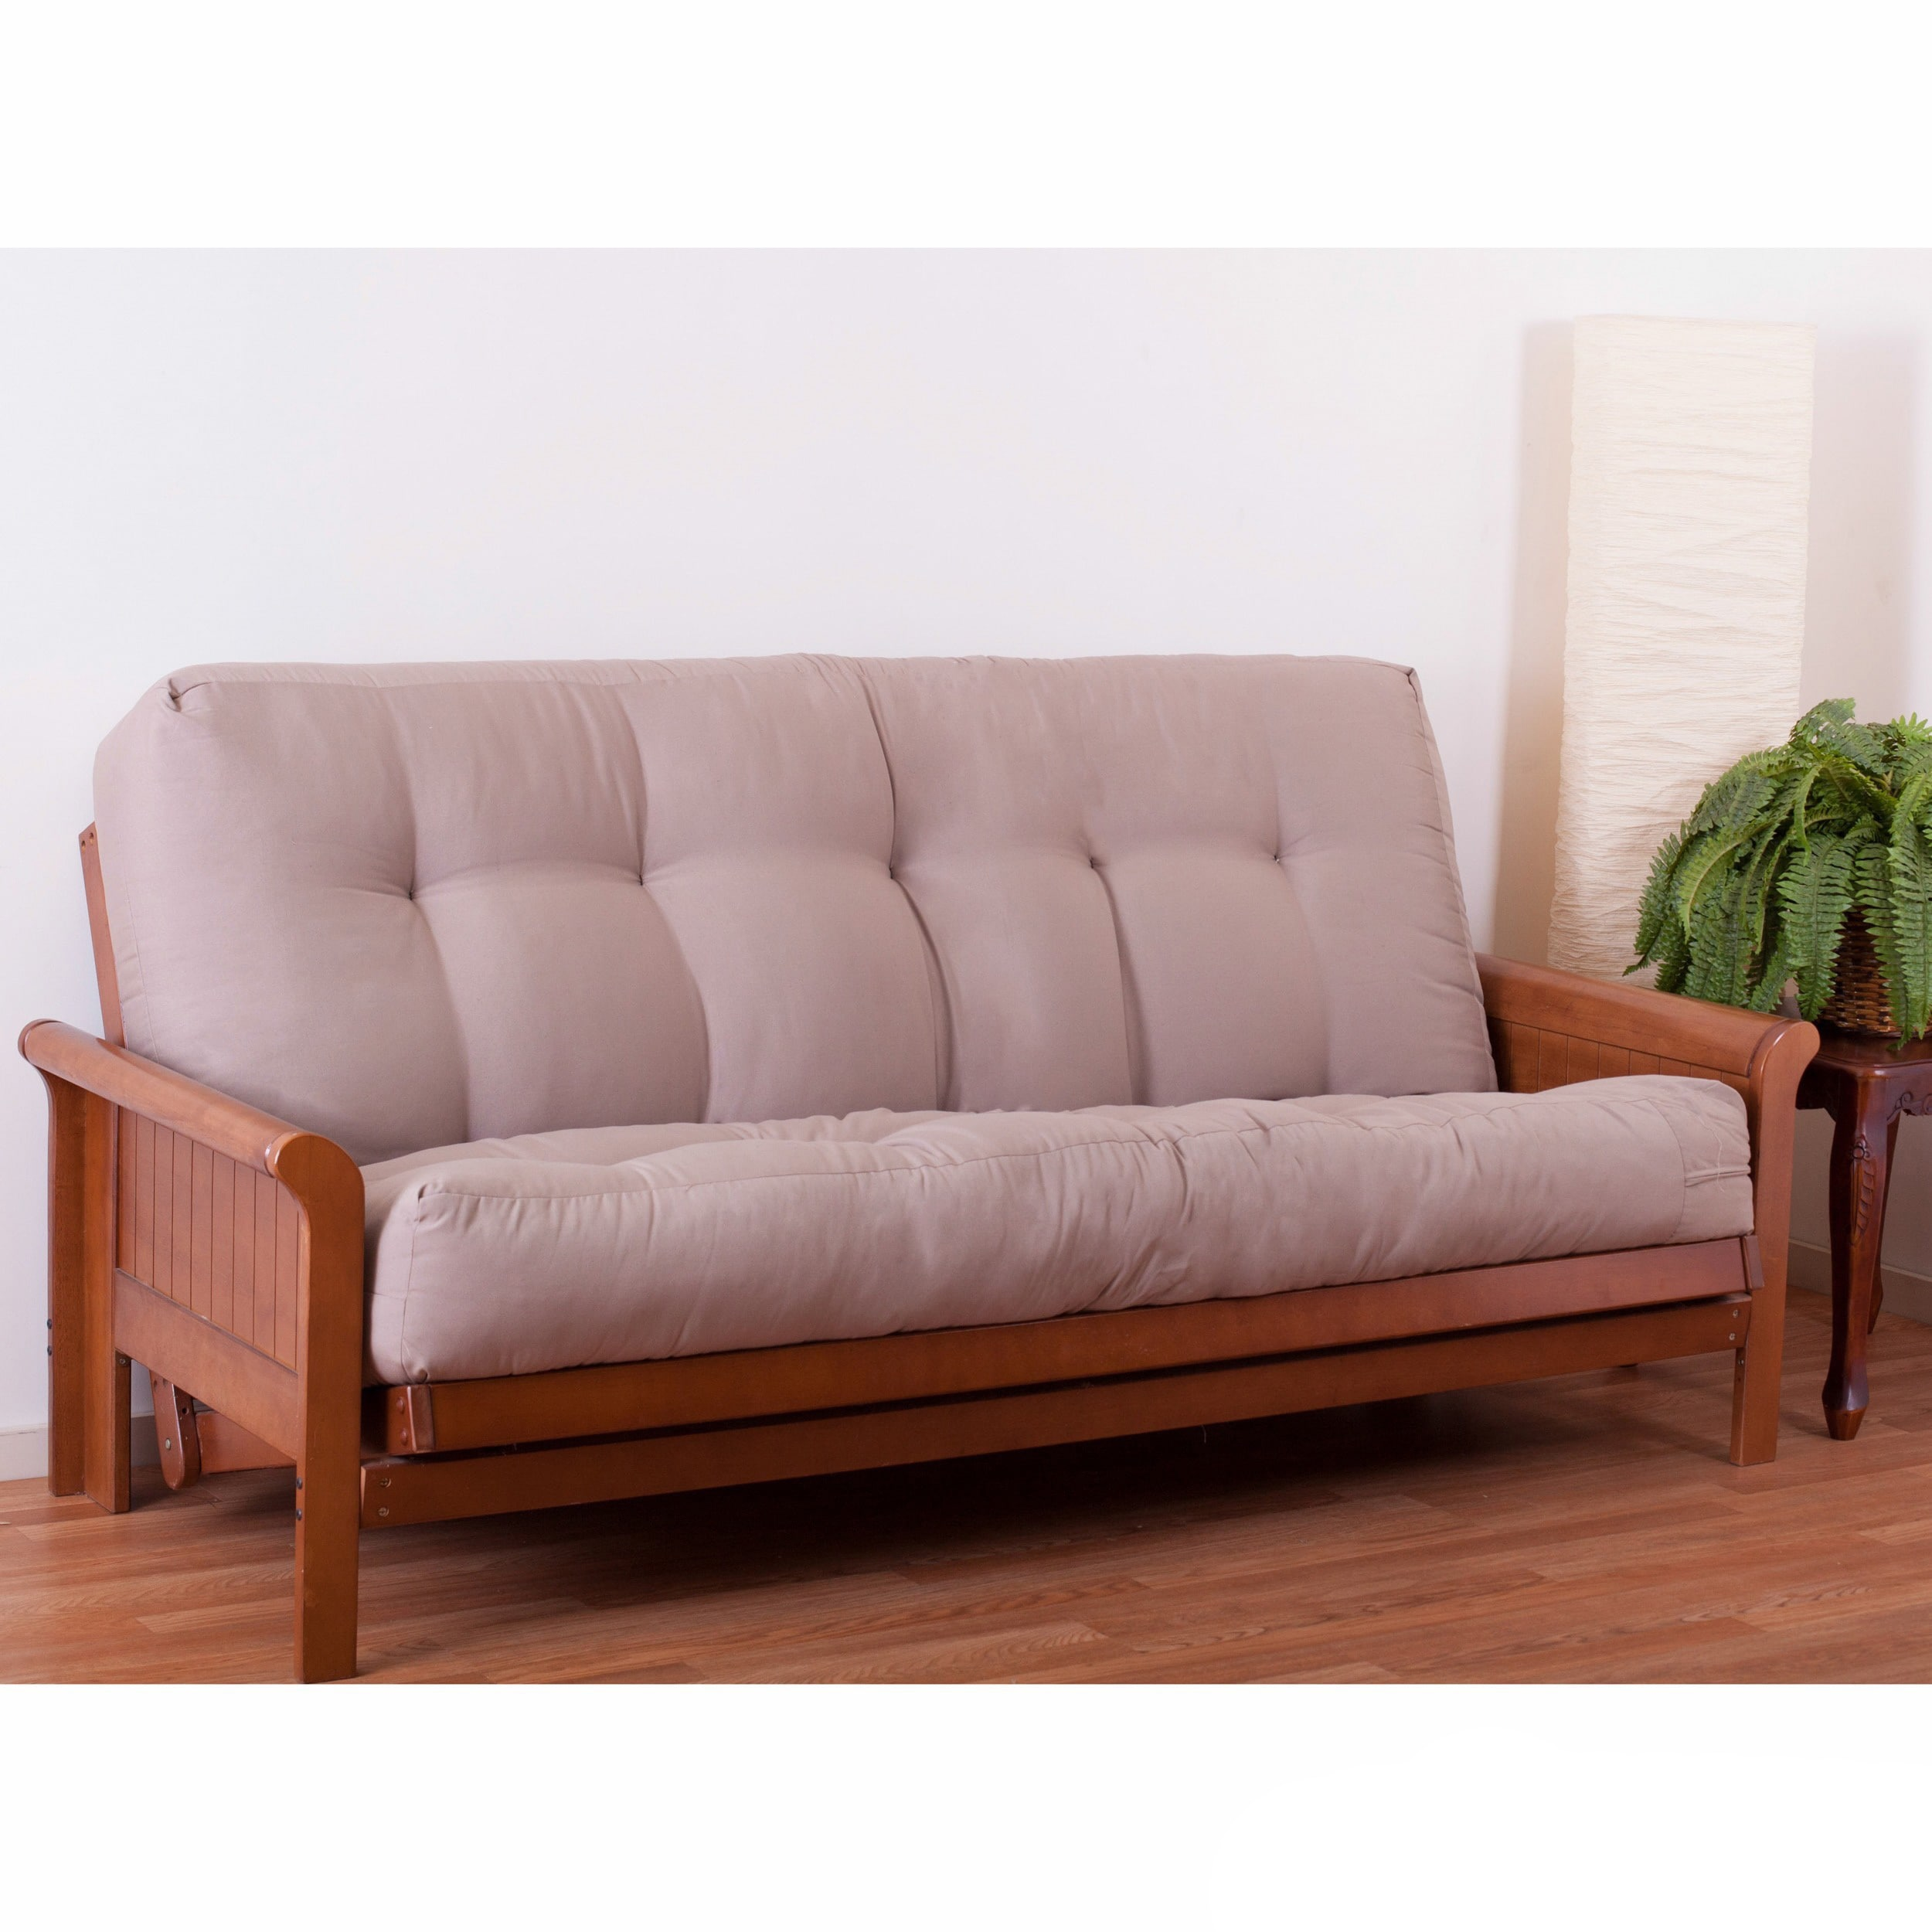 futon mattresses full size Barebearsbackyardco